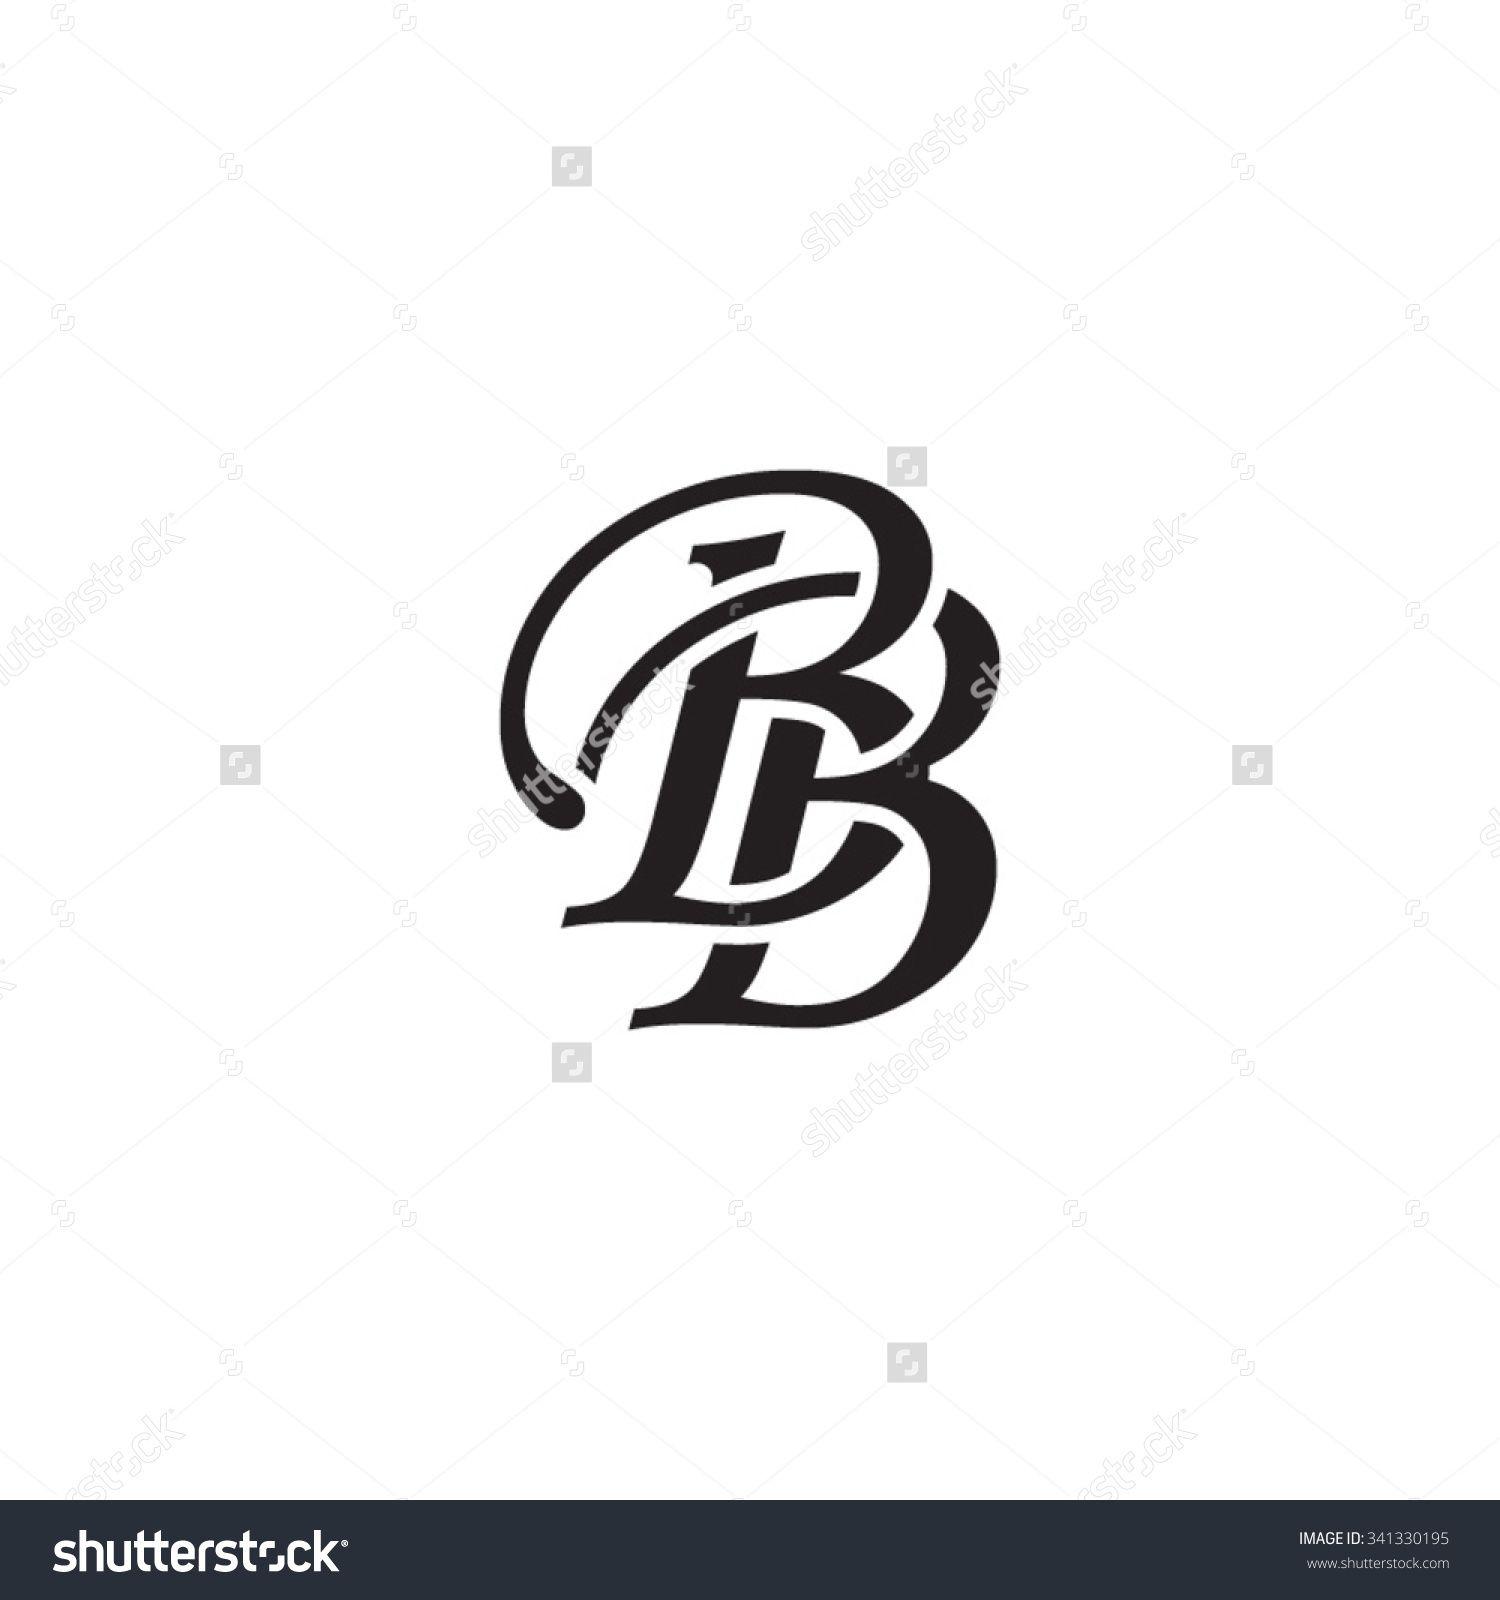 Tj initial luxury ornament monogram logo stock vector - Stock Vector Bb Initial Monogram Logo 341330195 Jpg